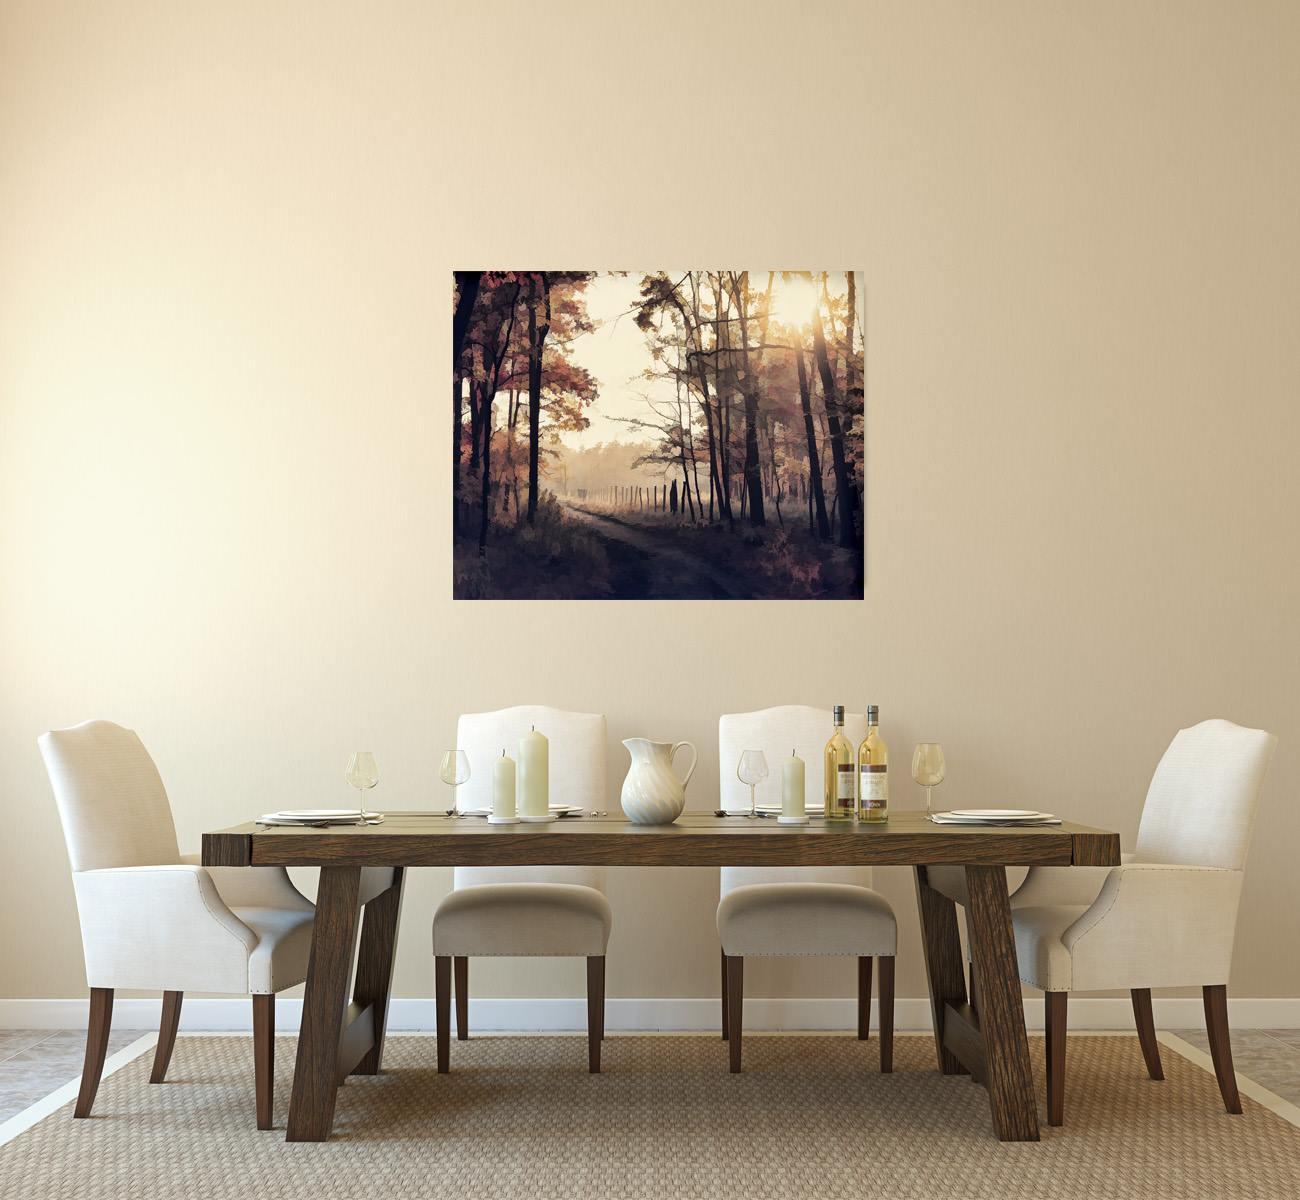 ArtBoja Custom Wall Decor Prints in the Dining Room